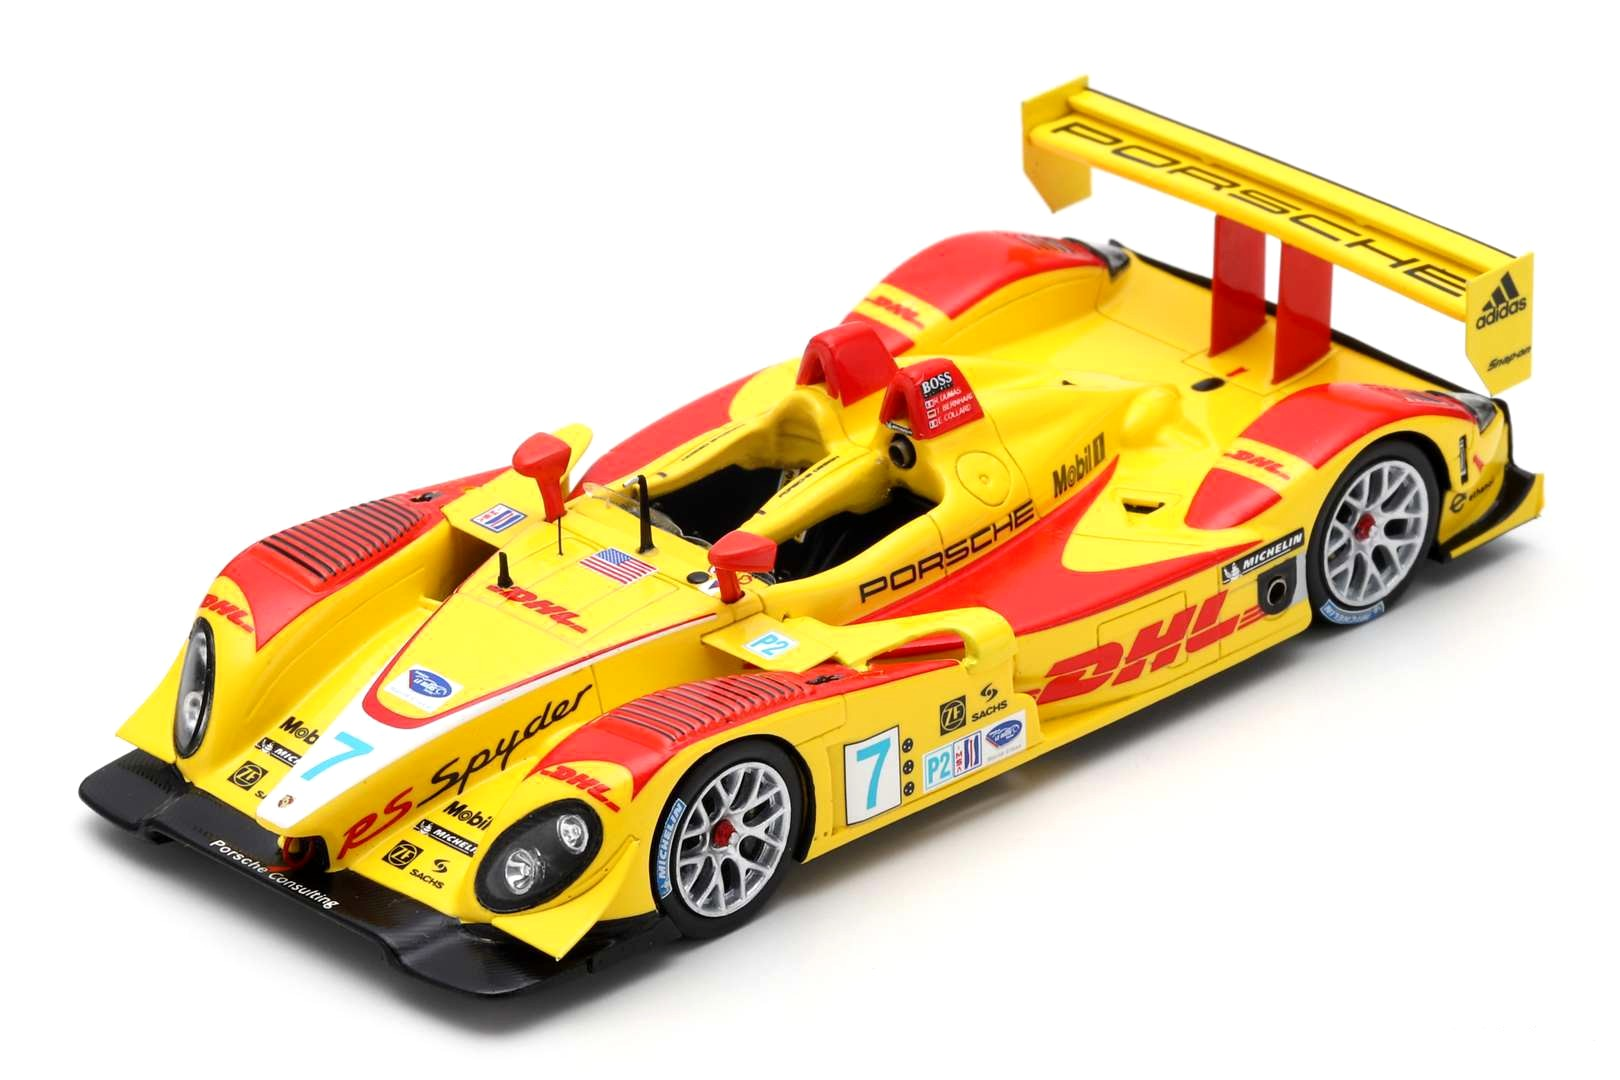 Vqr Collard Bernhard Porsche Dumas Sebring Spyder Rs 20087 8n0wPOk